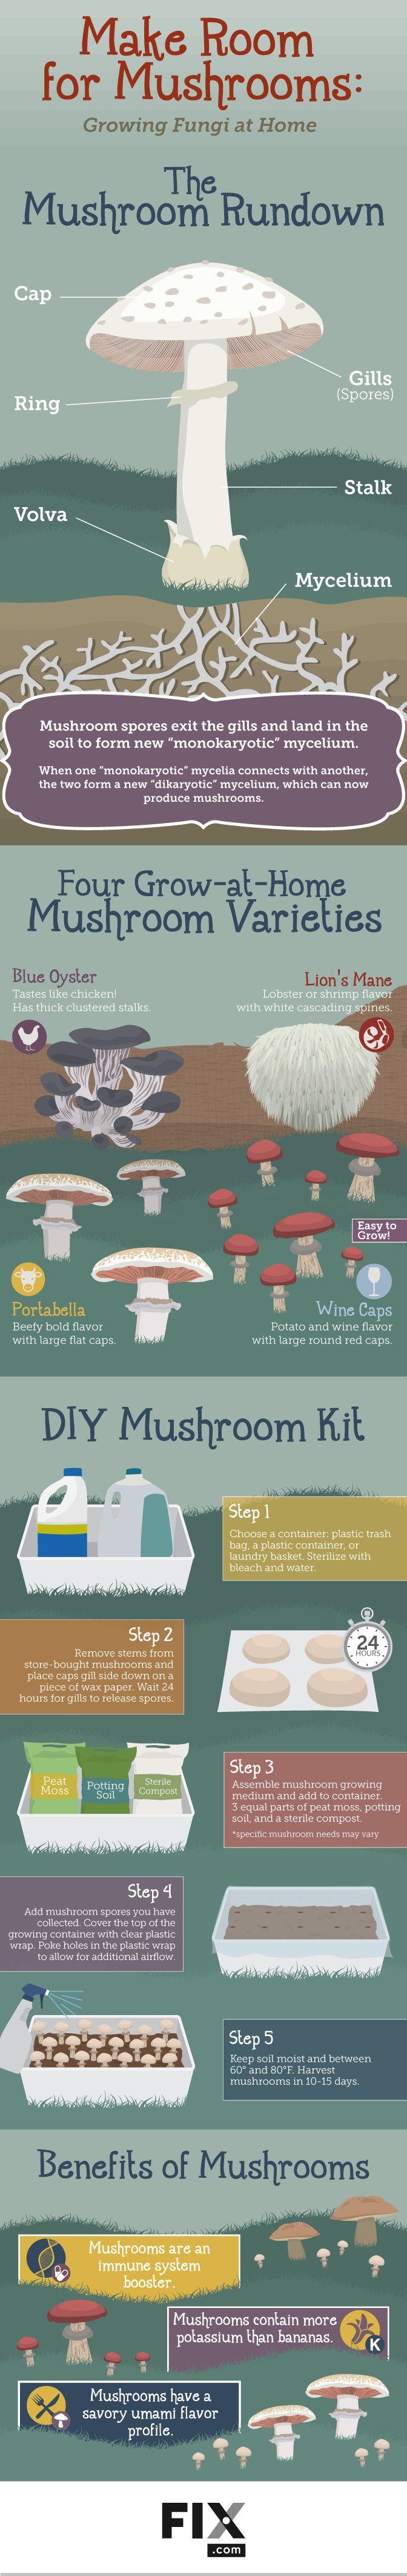 Make room for mushrooms!